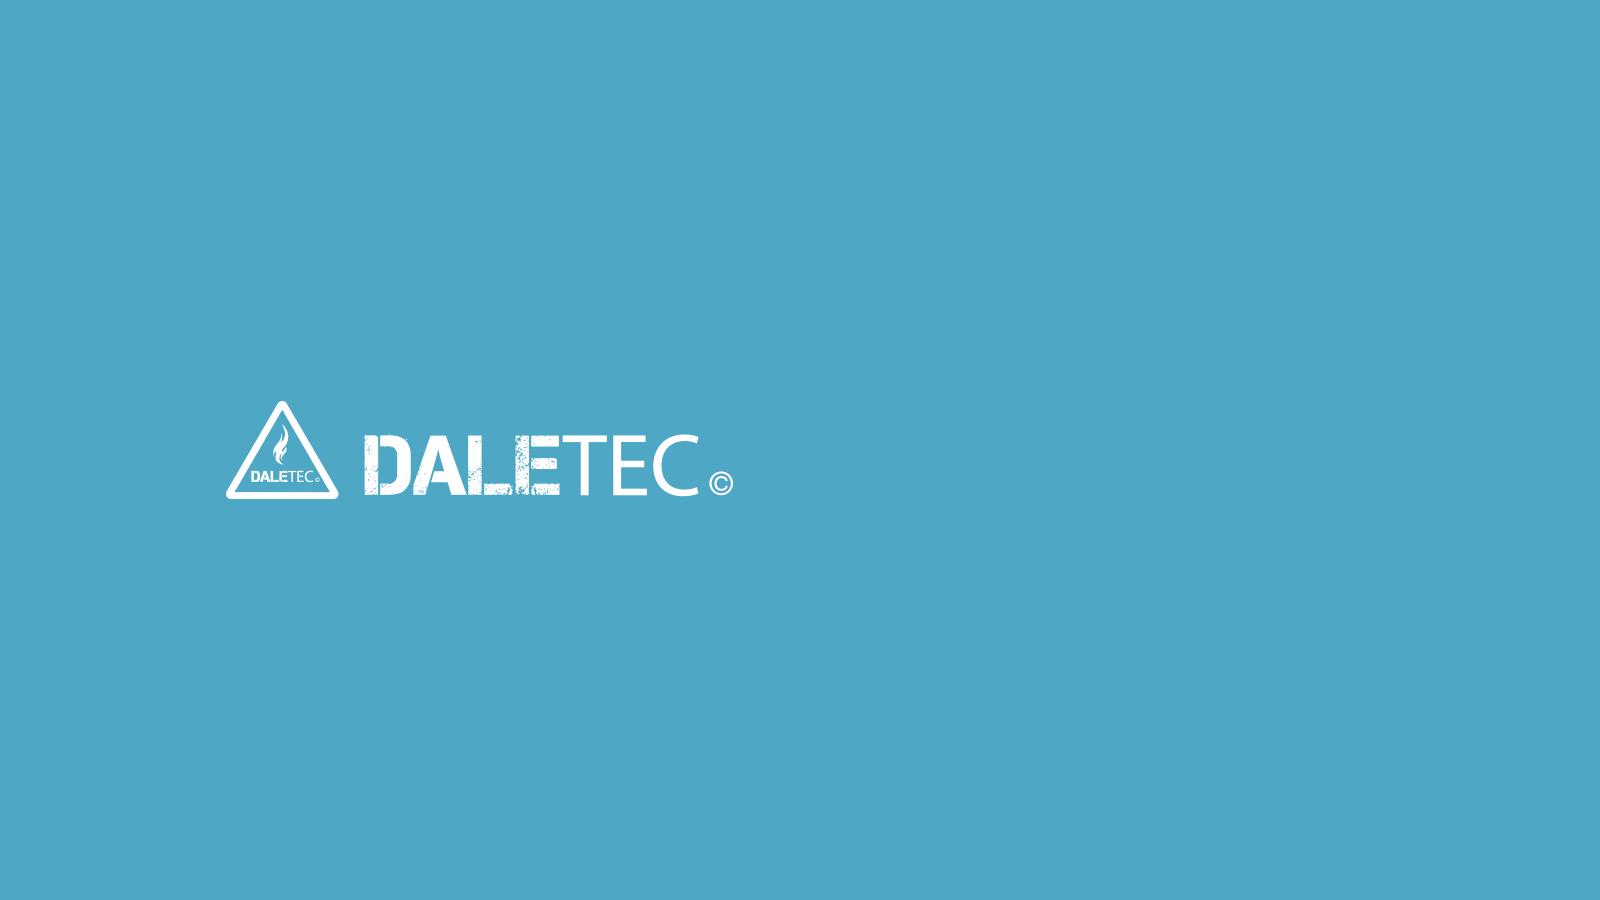 graphic-brand-design-web-designer-hiline-lahore-pakistan-daletec-banner